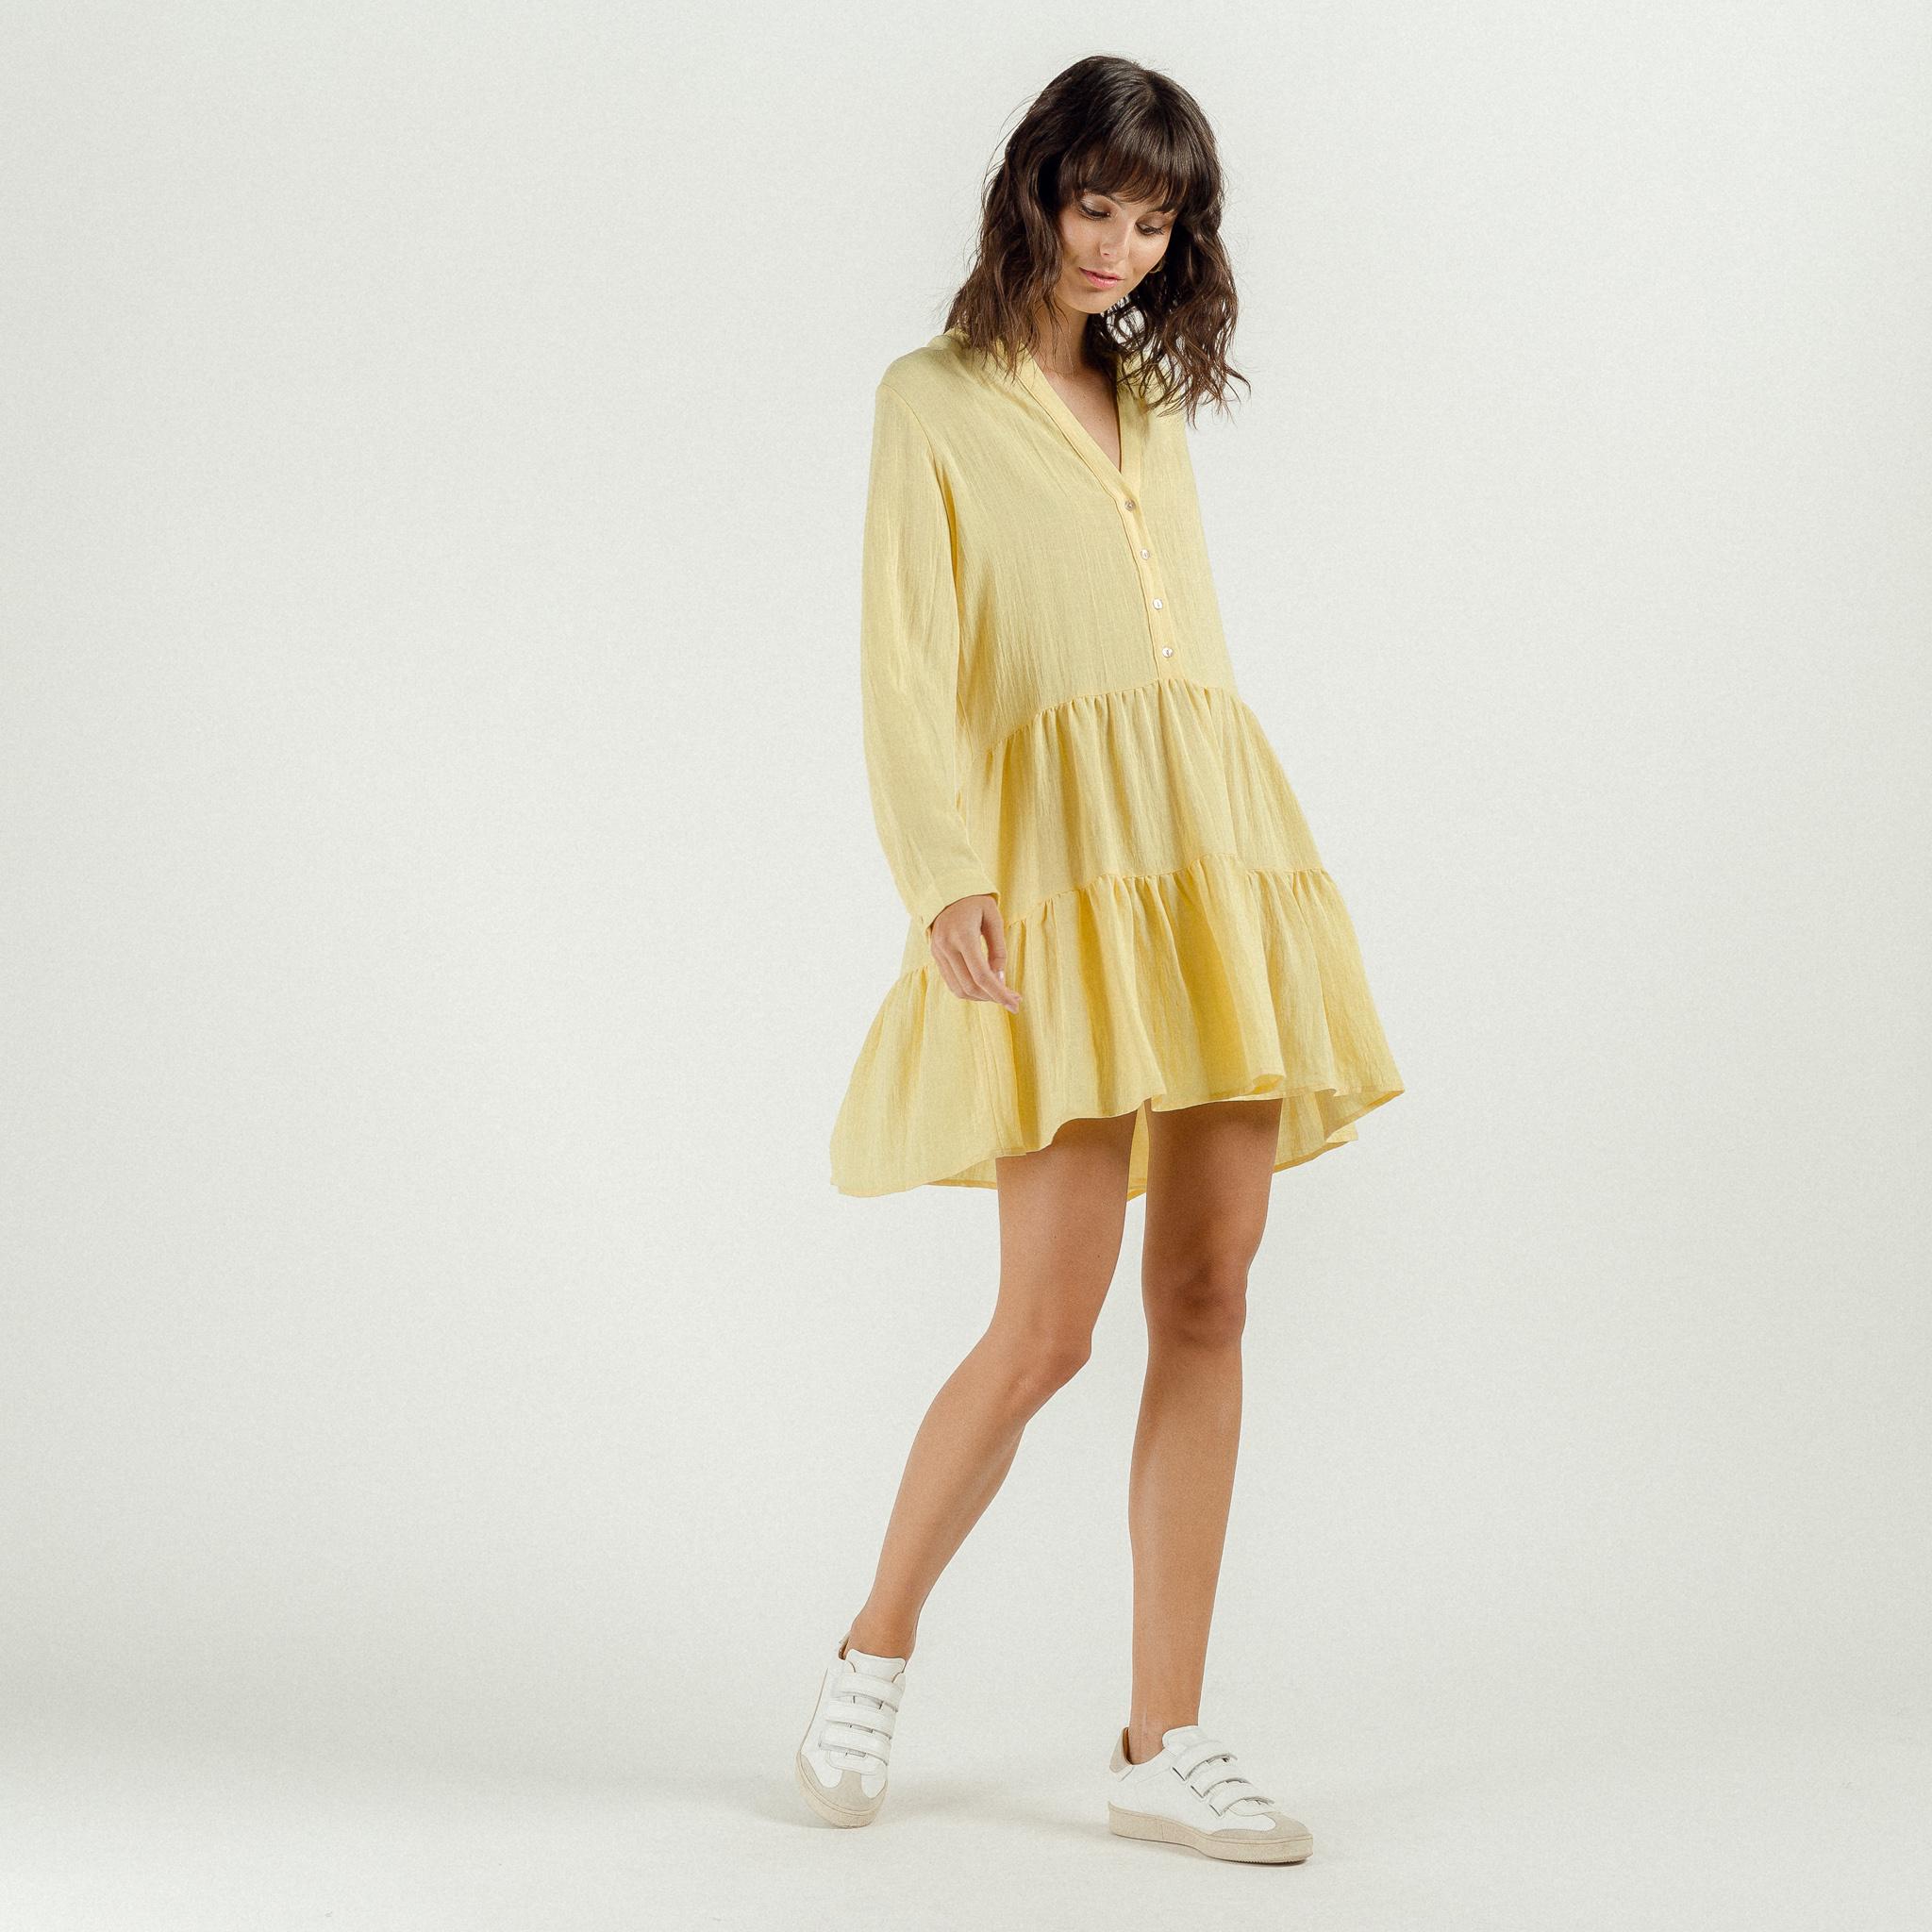 PEPITES robe yellow-3